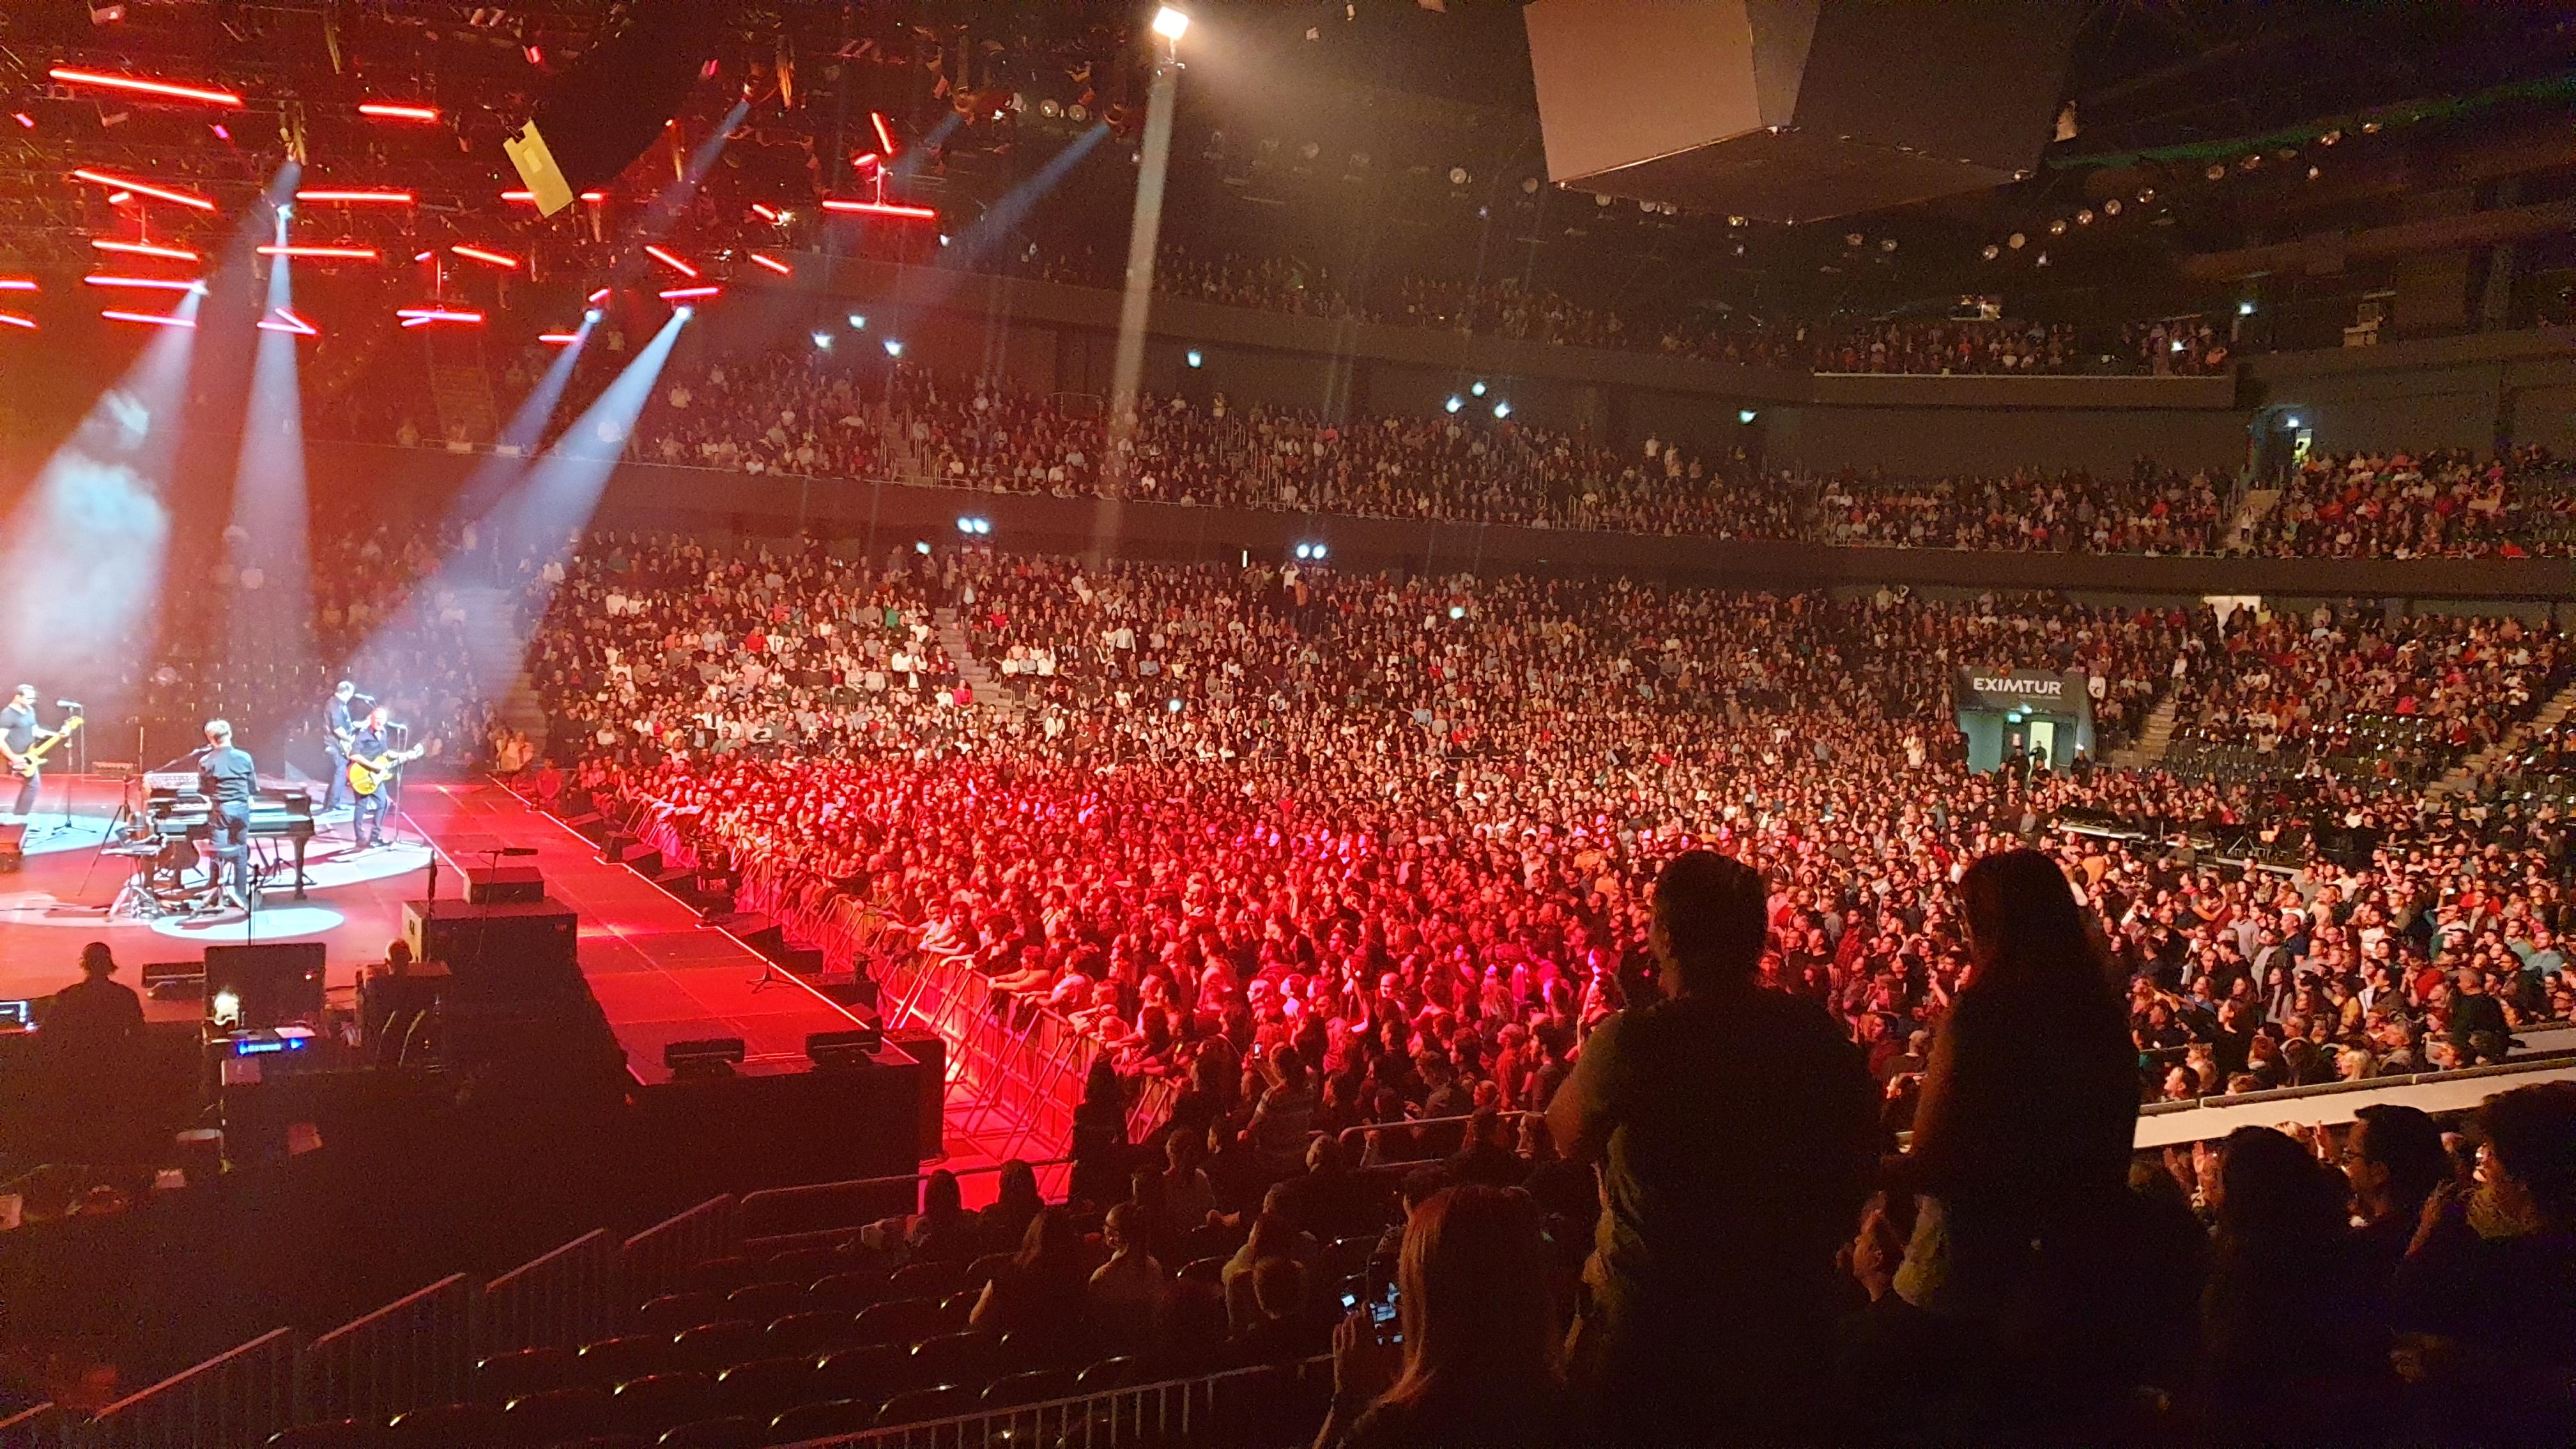 Cum a fost la Concert Bryan Adams